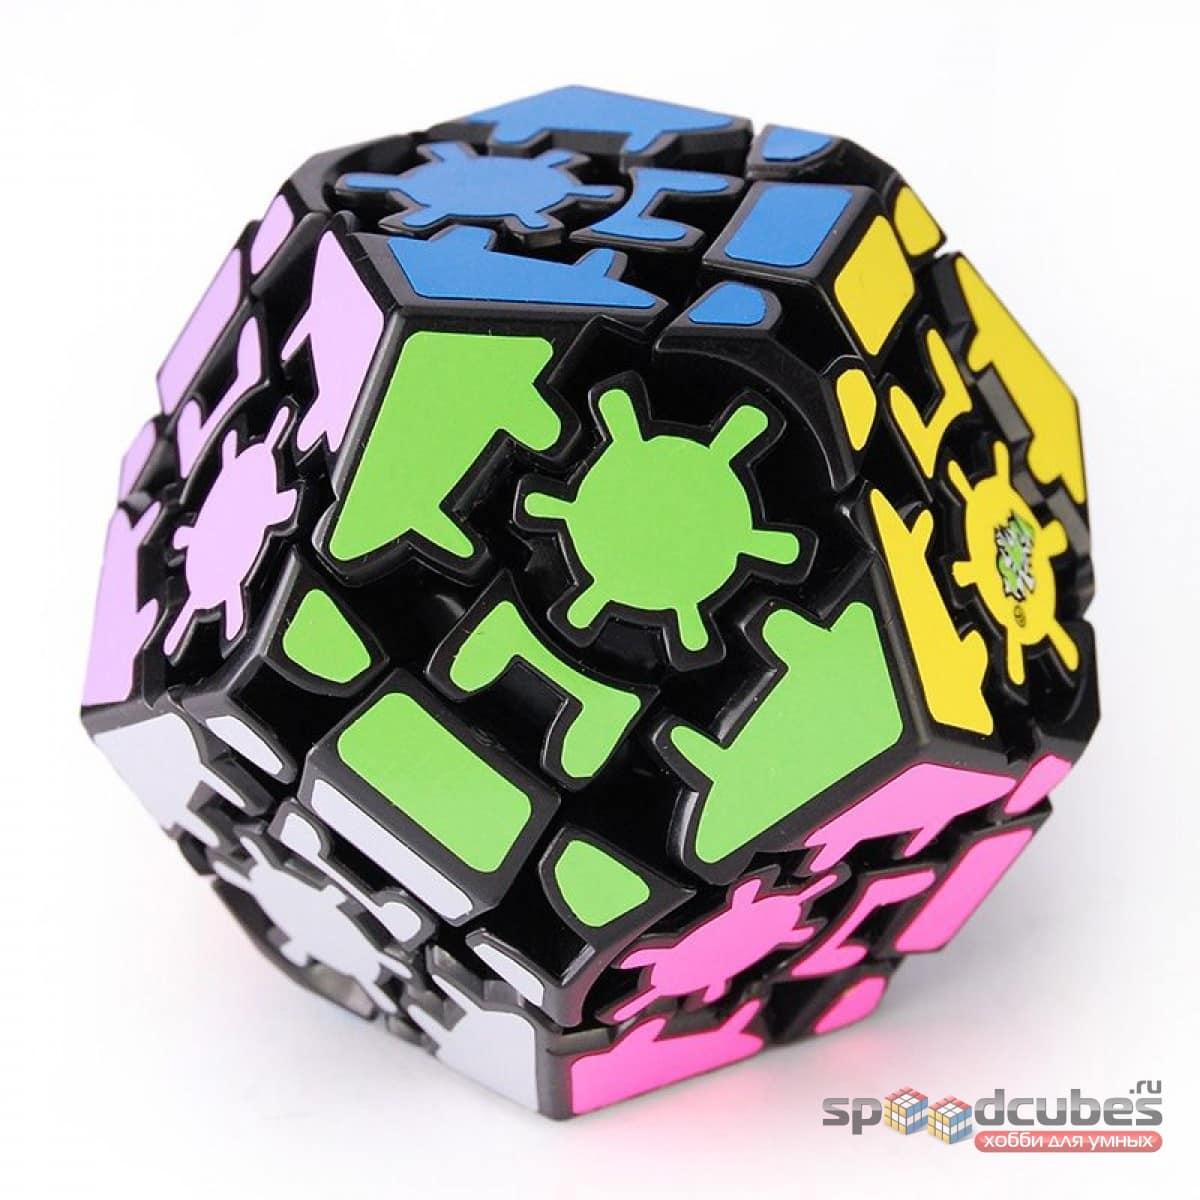 Lanlan Gear Dodecahedron 2